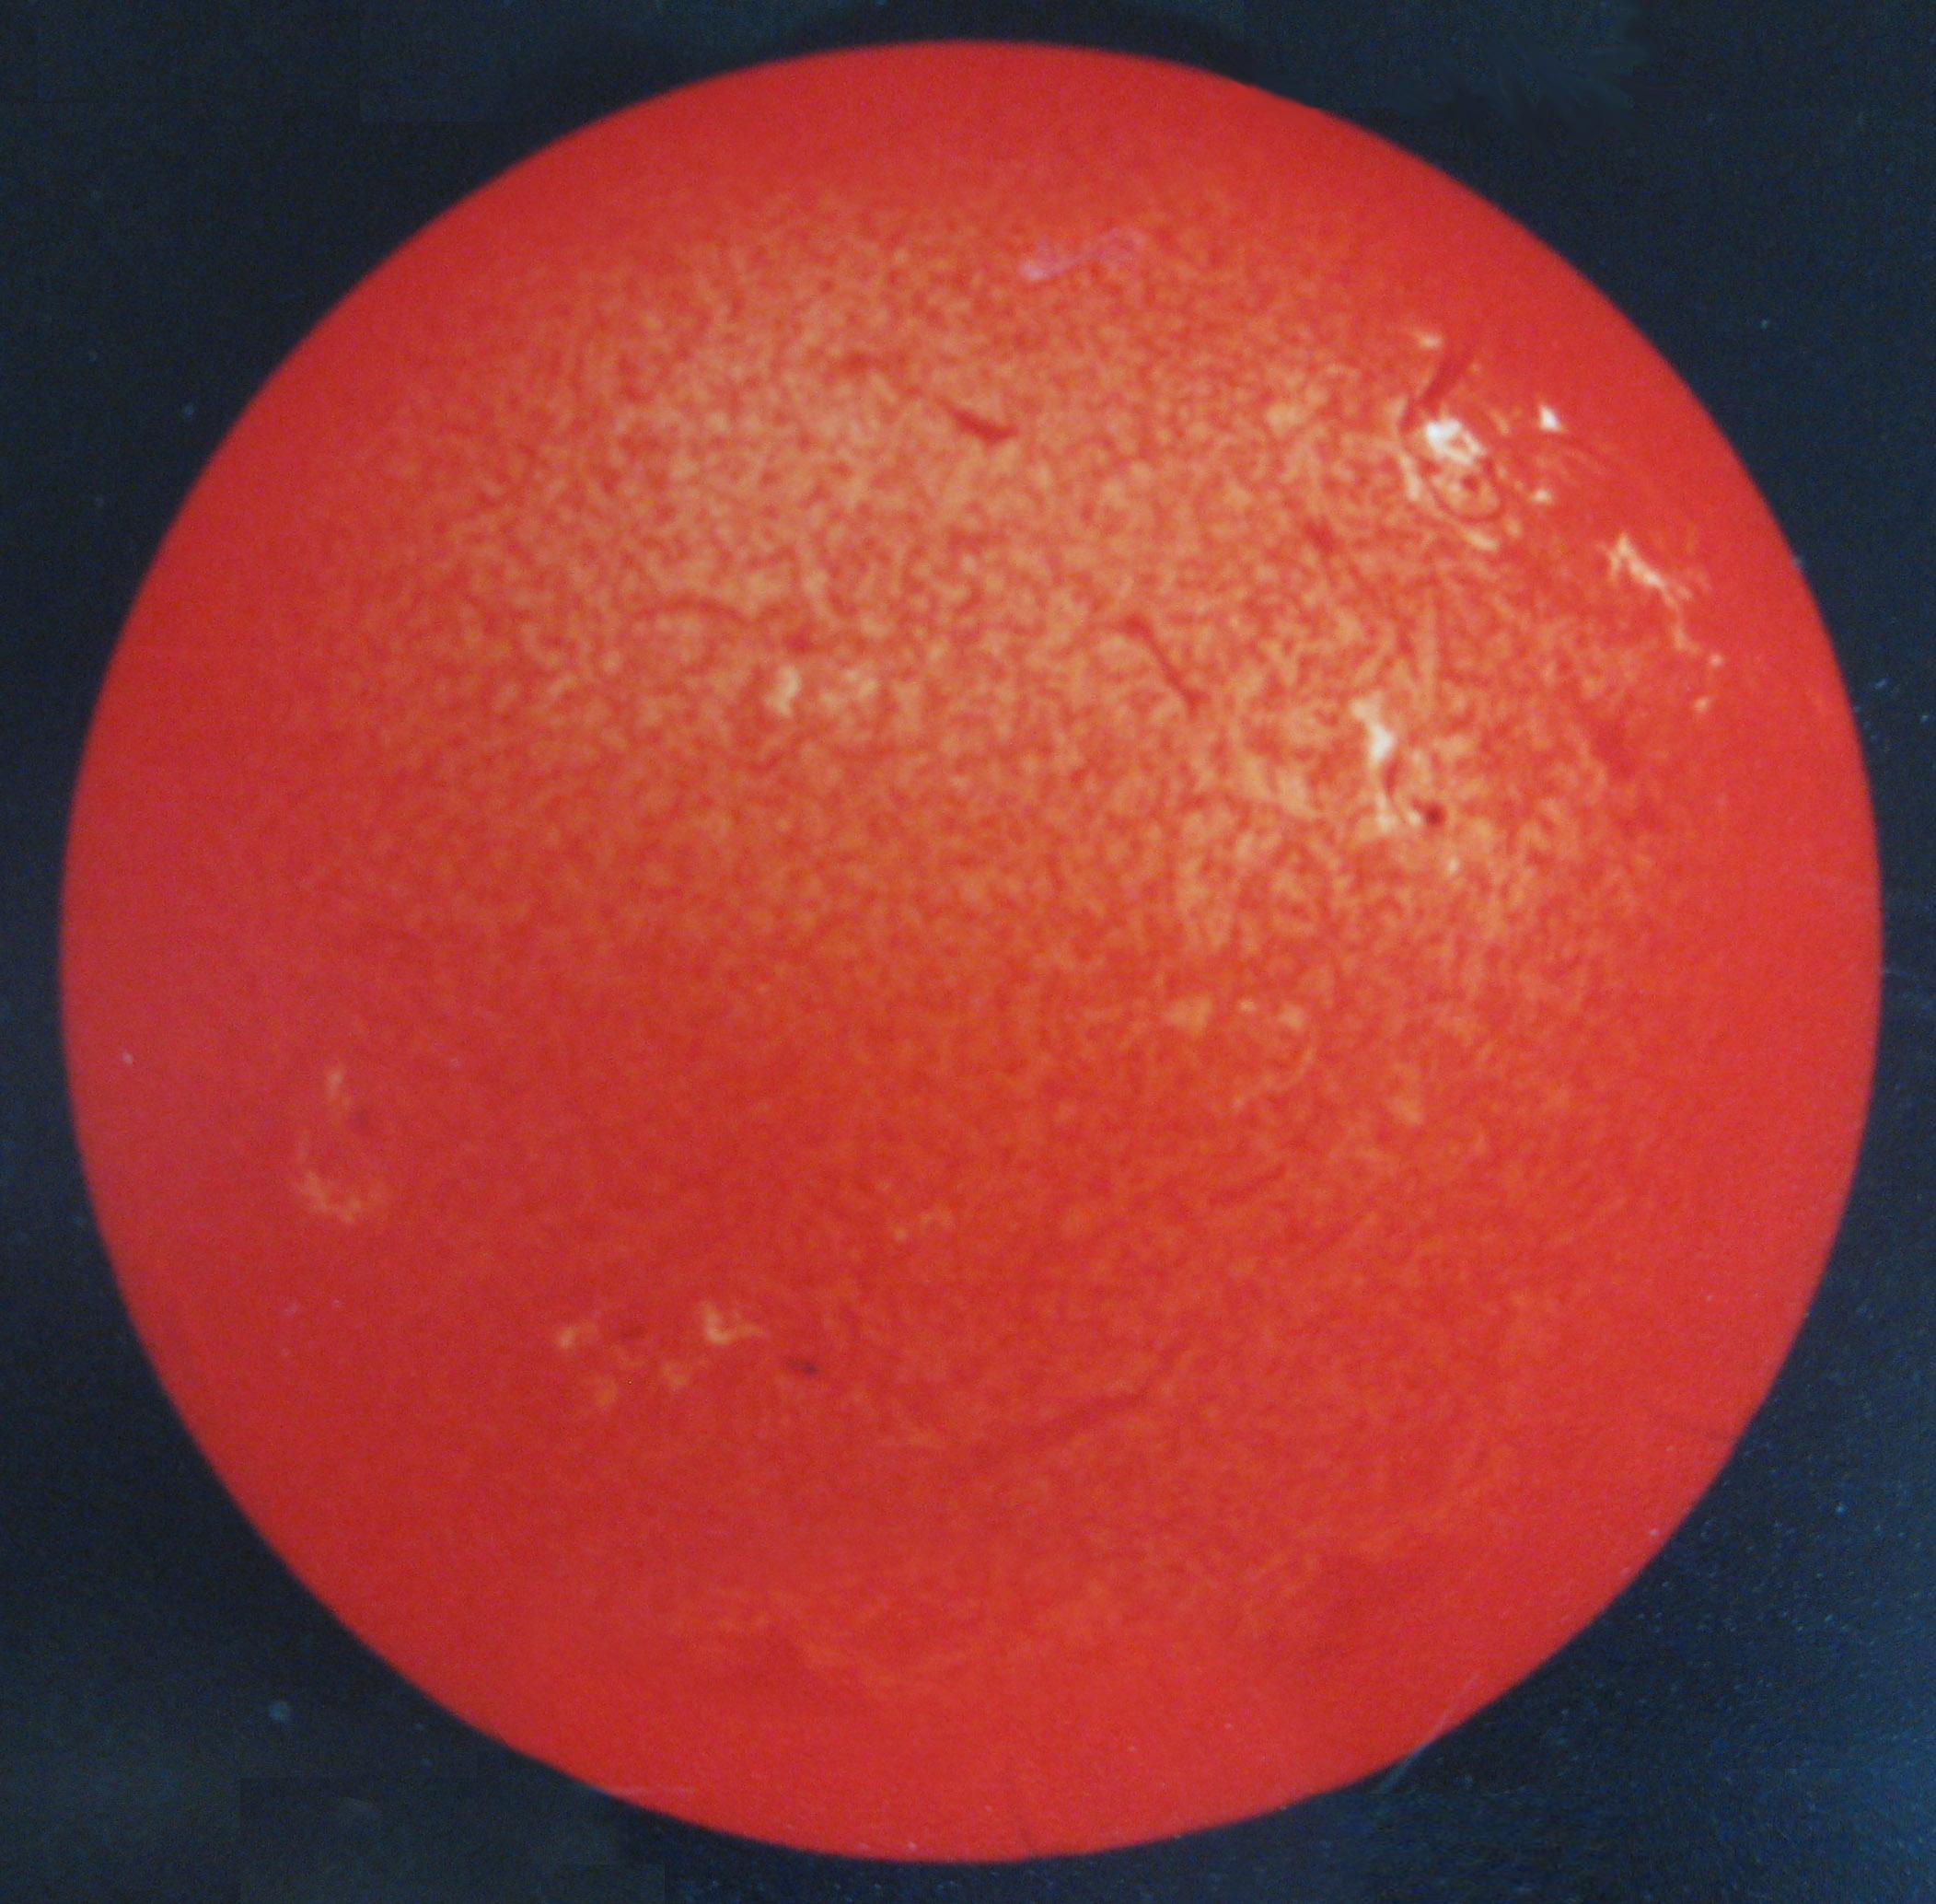 File:Sun image through solar telescope.jpg - Wikimedia Commons